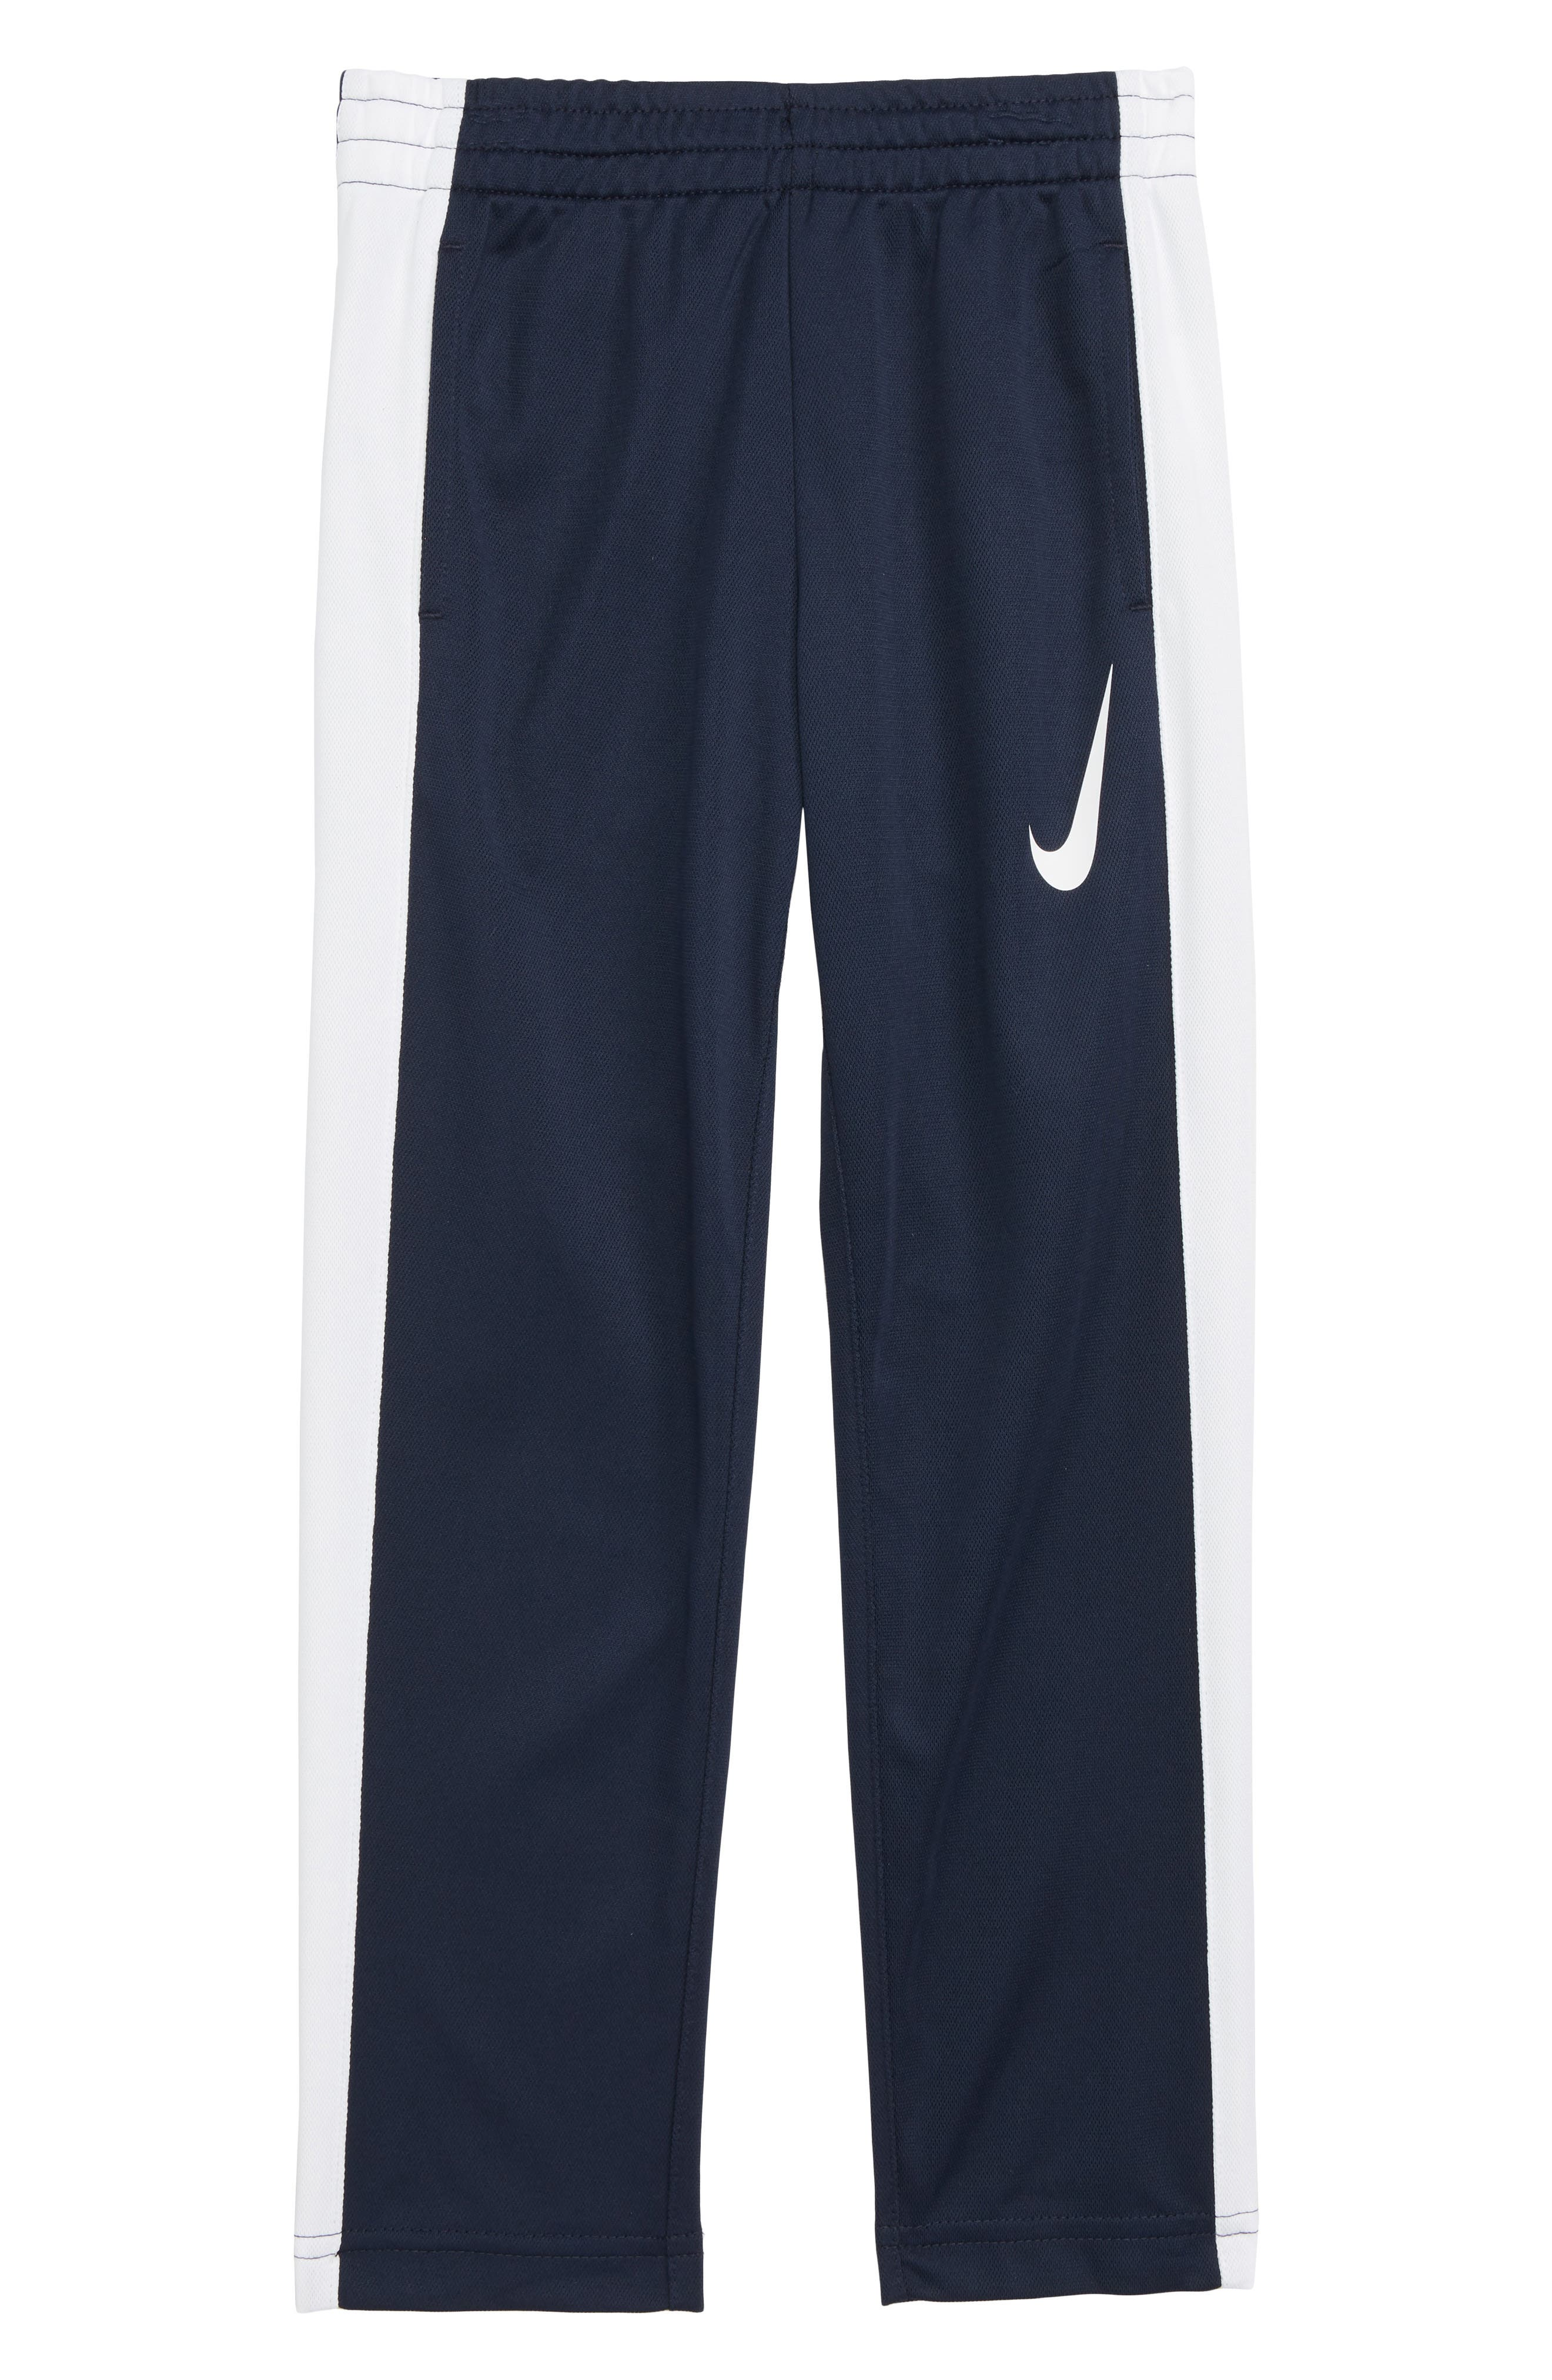 NIKE Performance Knit Track Pants, Main, color, 402